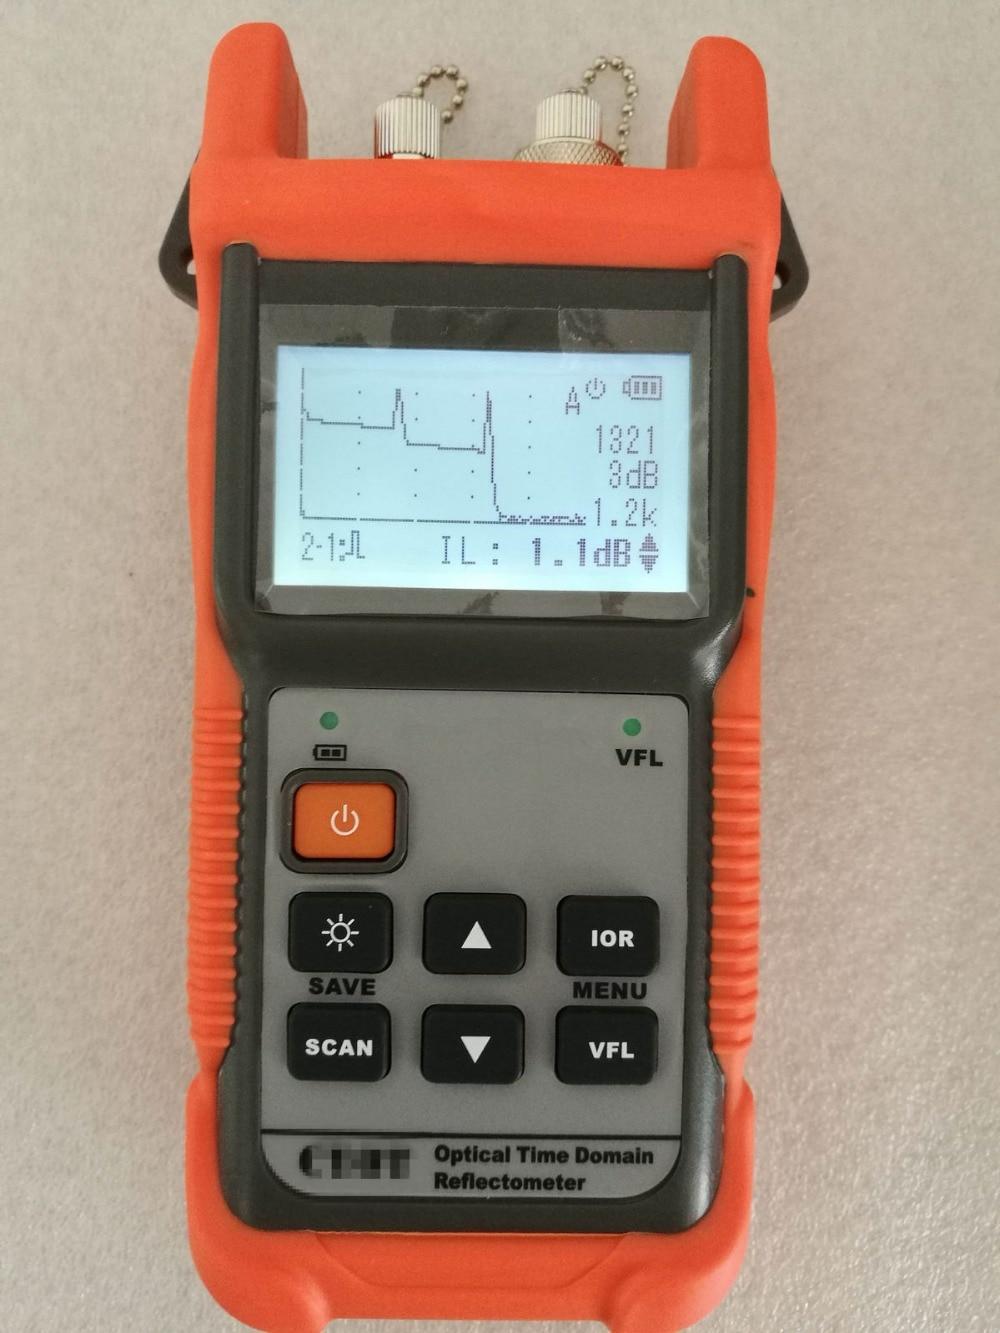 Optical Fiber Ranger MINI OTDR 12dB Fiber find fault tester 1310/1550nm +1mW VFLOptical Fiber Ranger MINI OTDR 12dB Fiber find fault tester 1310/1550nm +1mW VFL